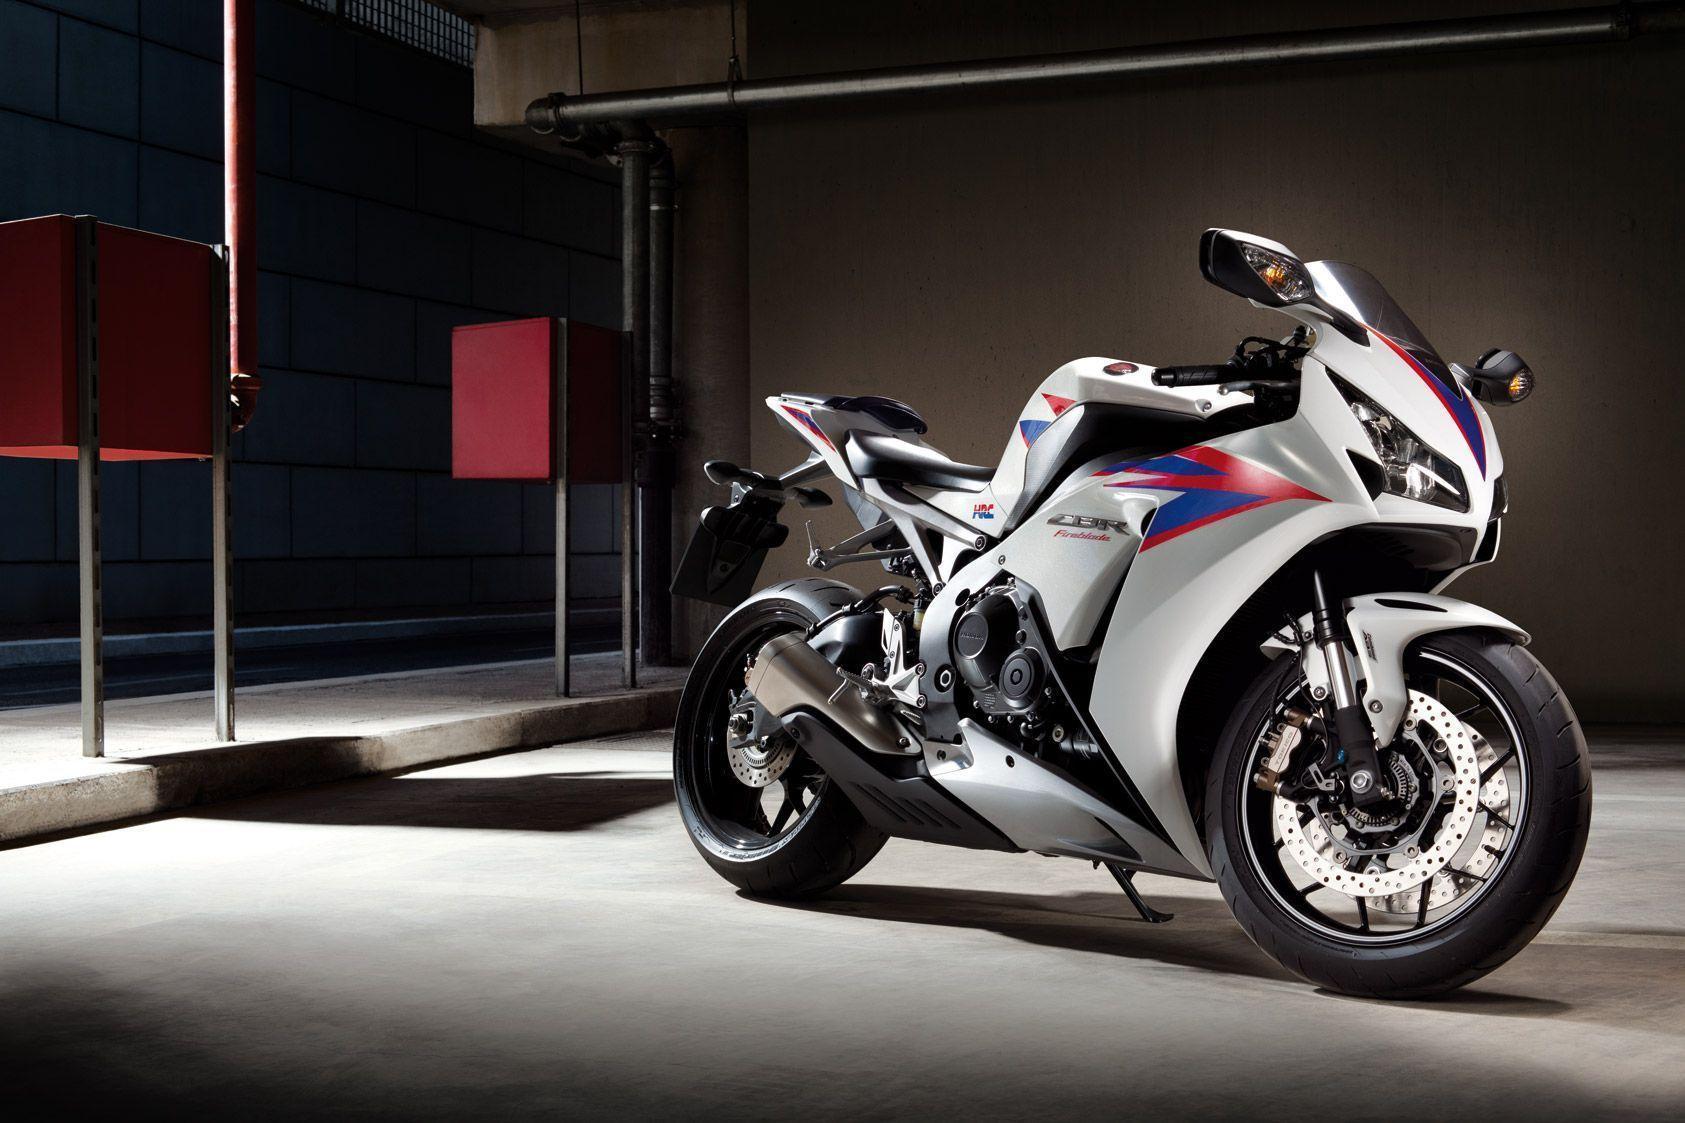 Honda CBR1000RR Wallpapers   Top Honda CBR1000RR Backgrounds 1685x1123